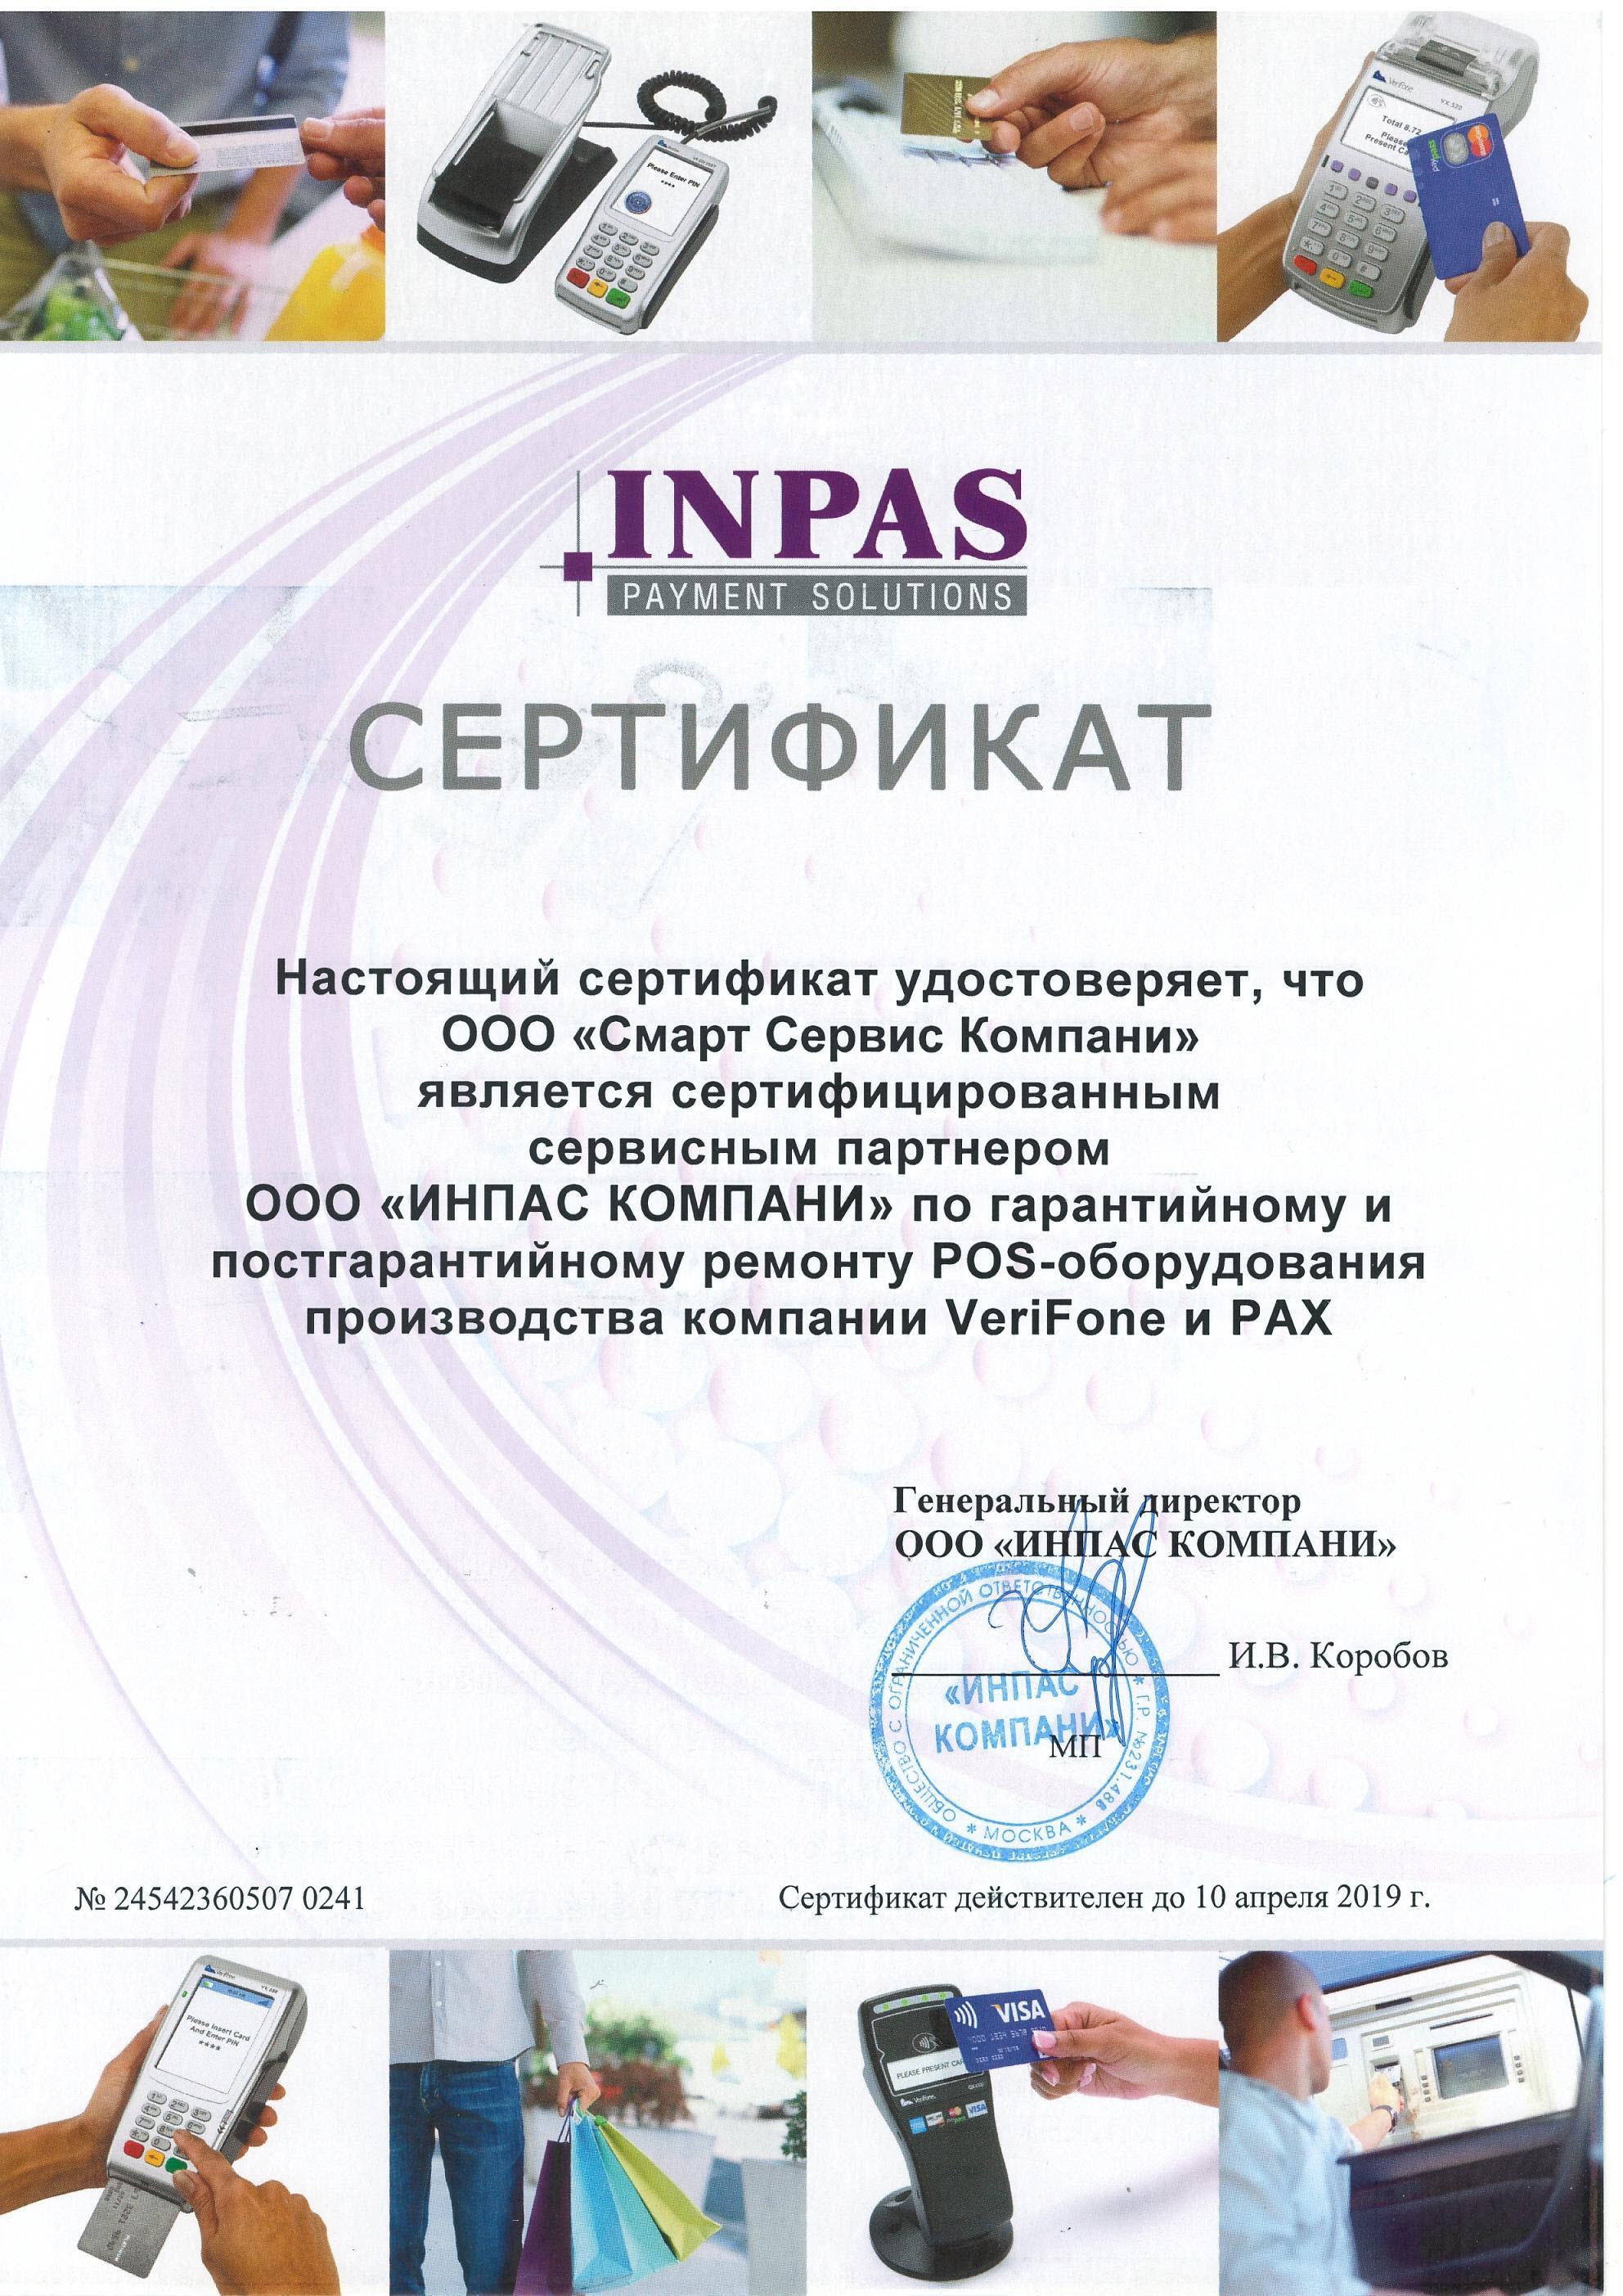 INPAS